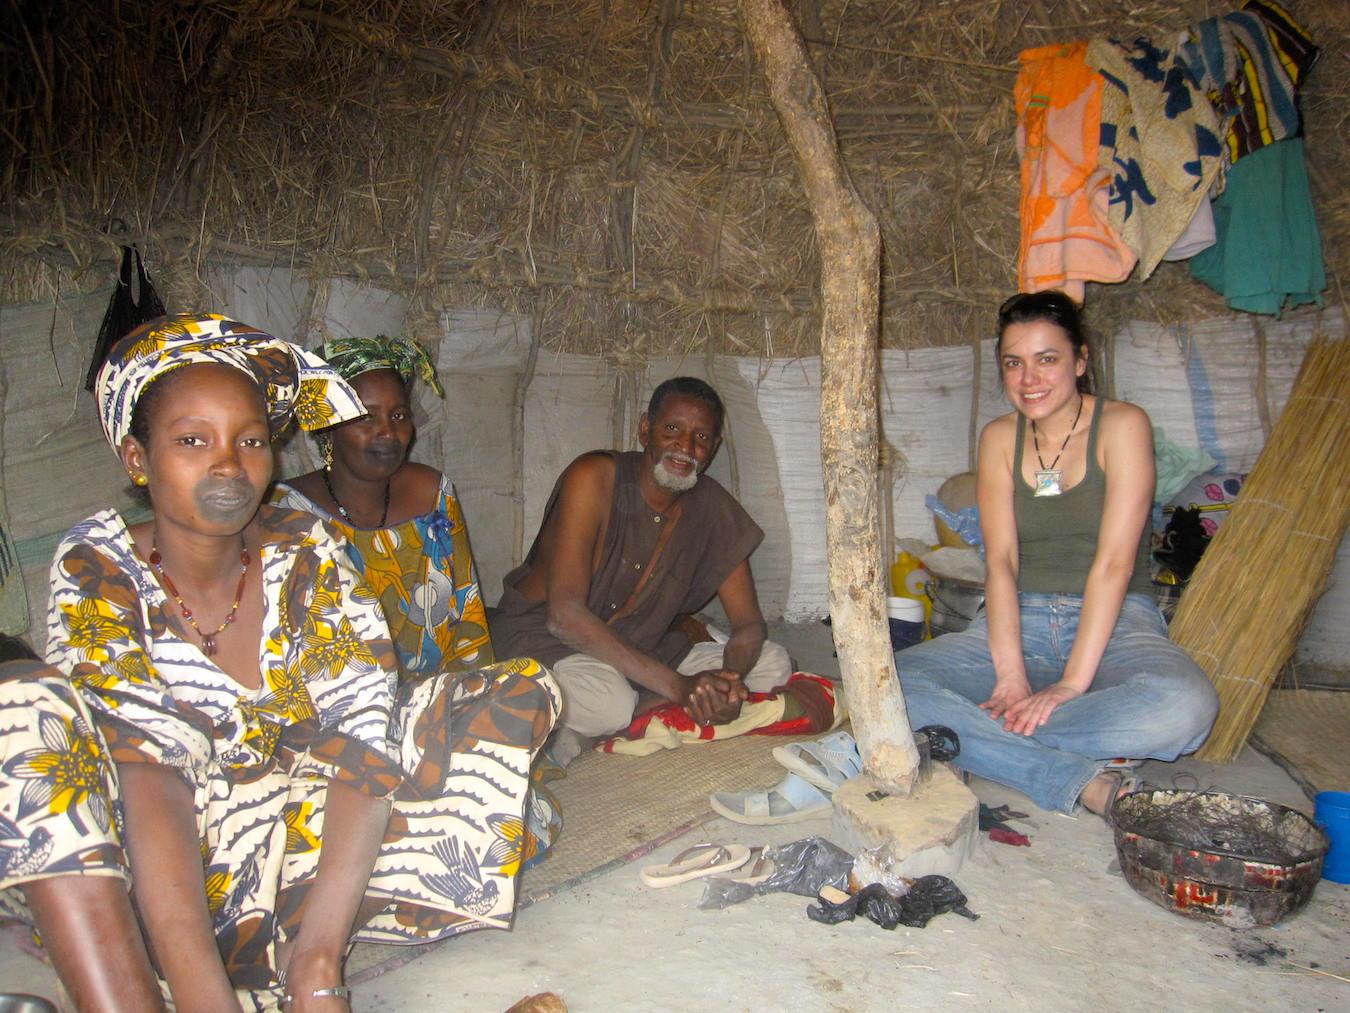 Fulani women (Peul) with the tchoodiaround their mouths. Photo: Patti Neves